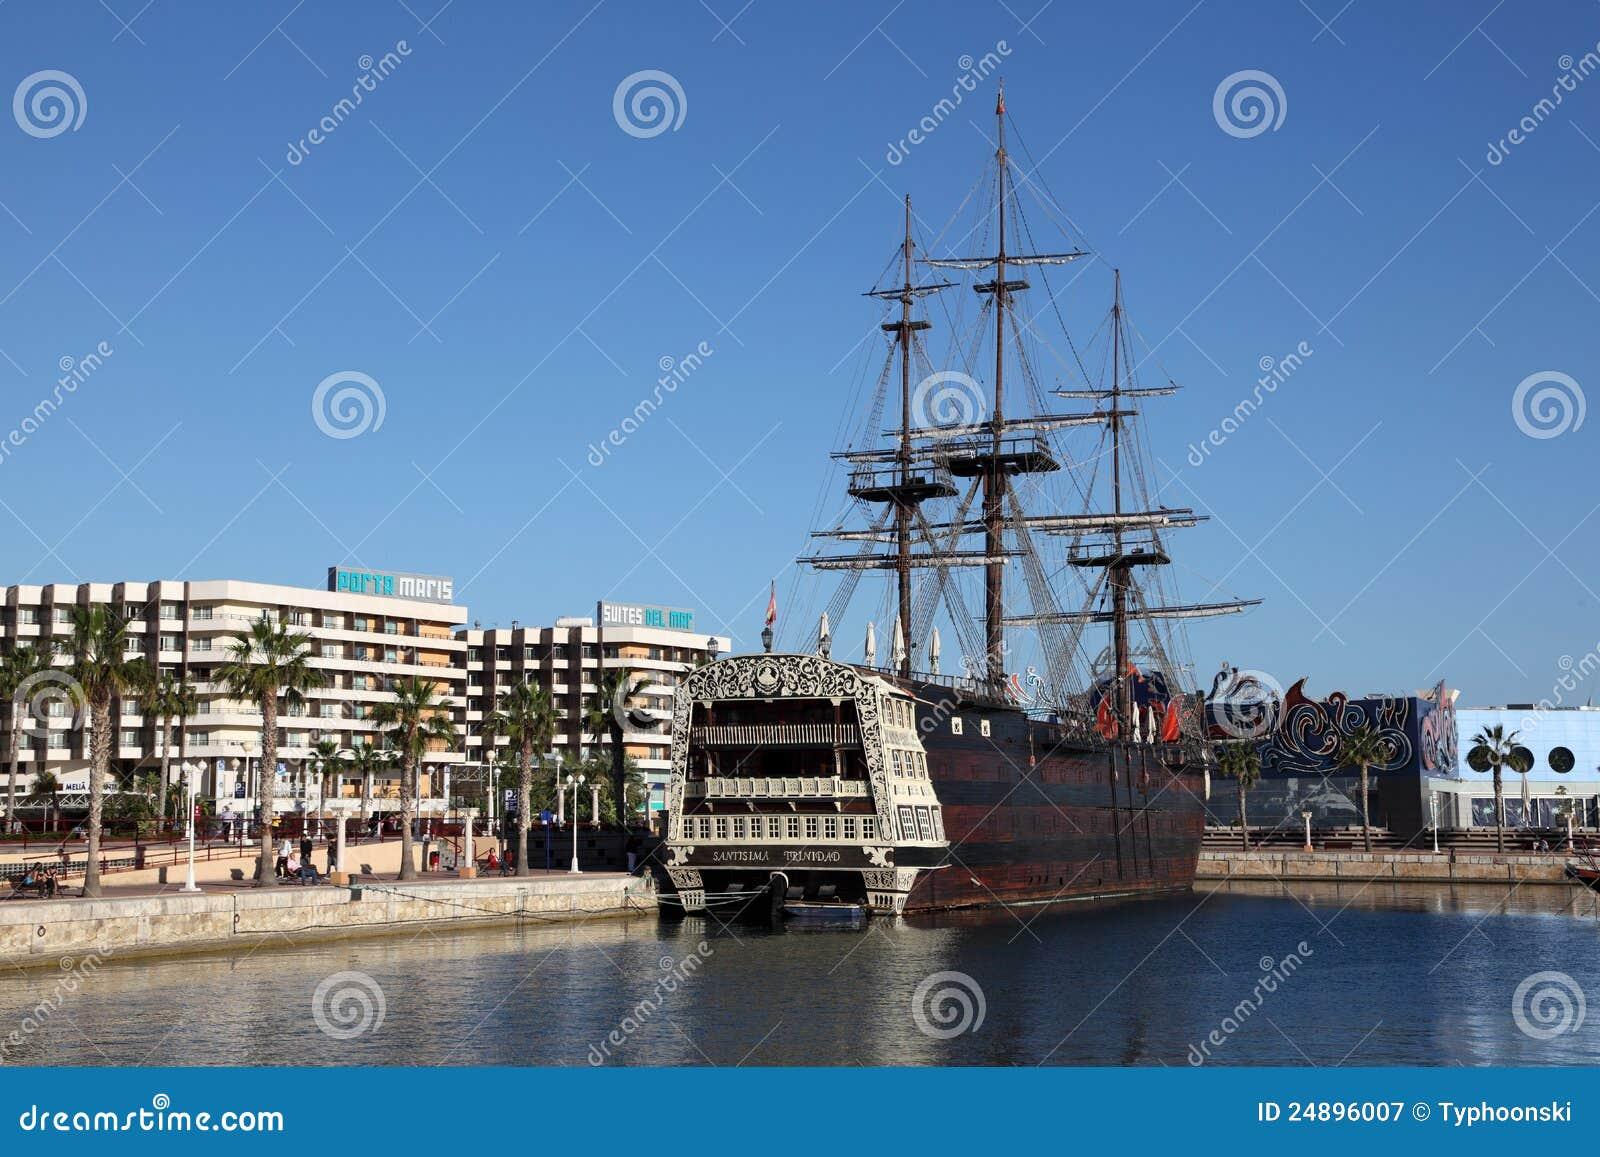 Bateau de pirate alicante espagne photographie - Photo de bateau pirate ...